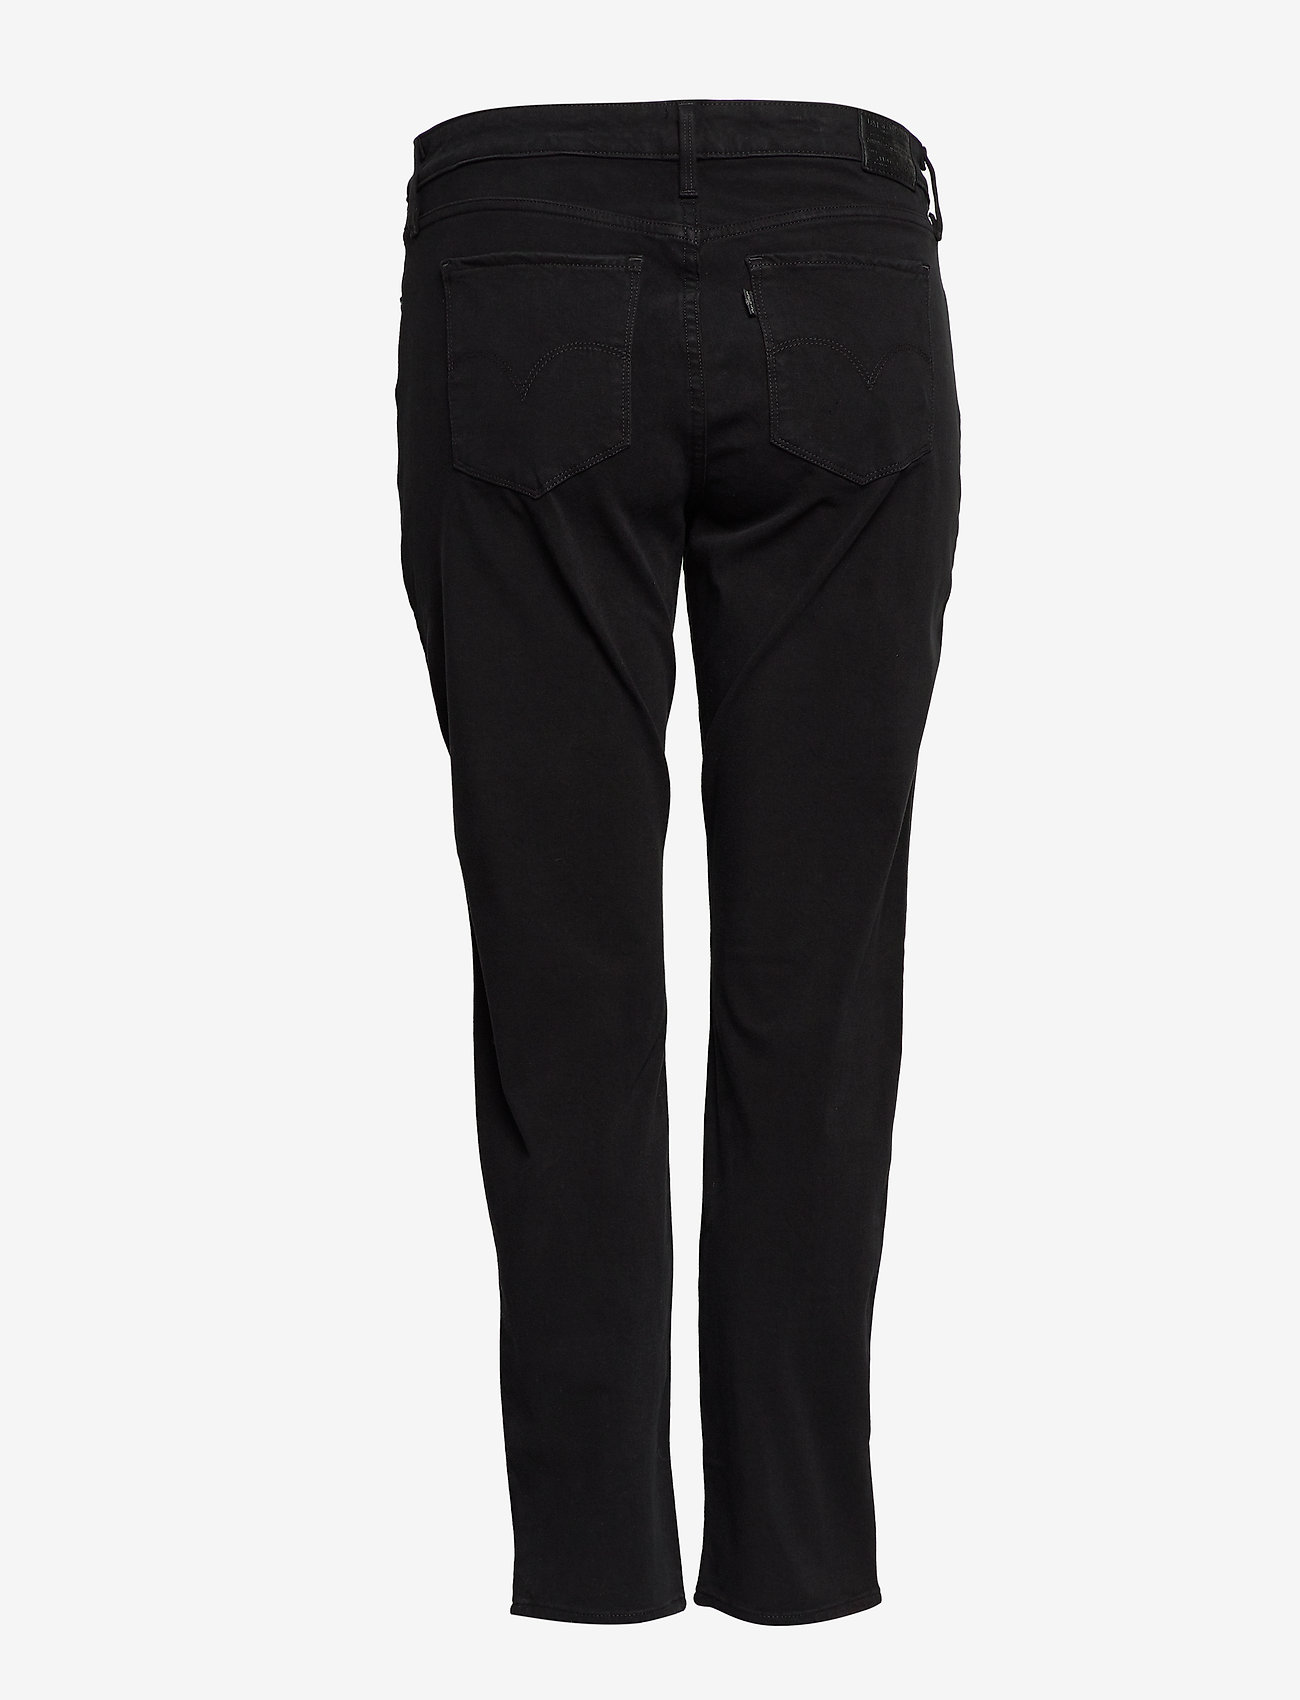 Levi's Plus Size - 311 PL SHAPING SKINNY 4X STRET - skinny jeans - blacks - 1